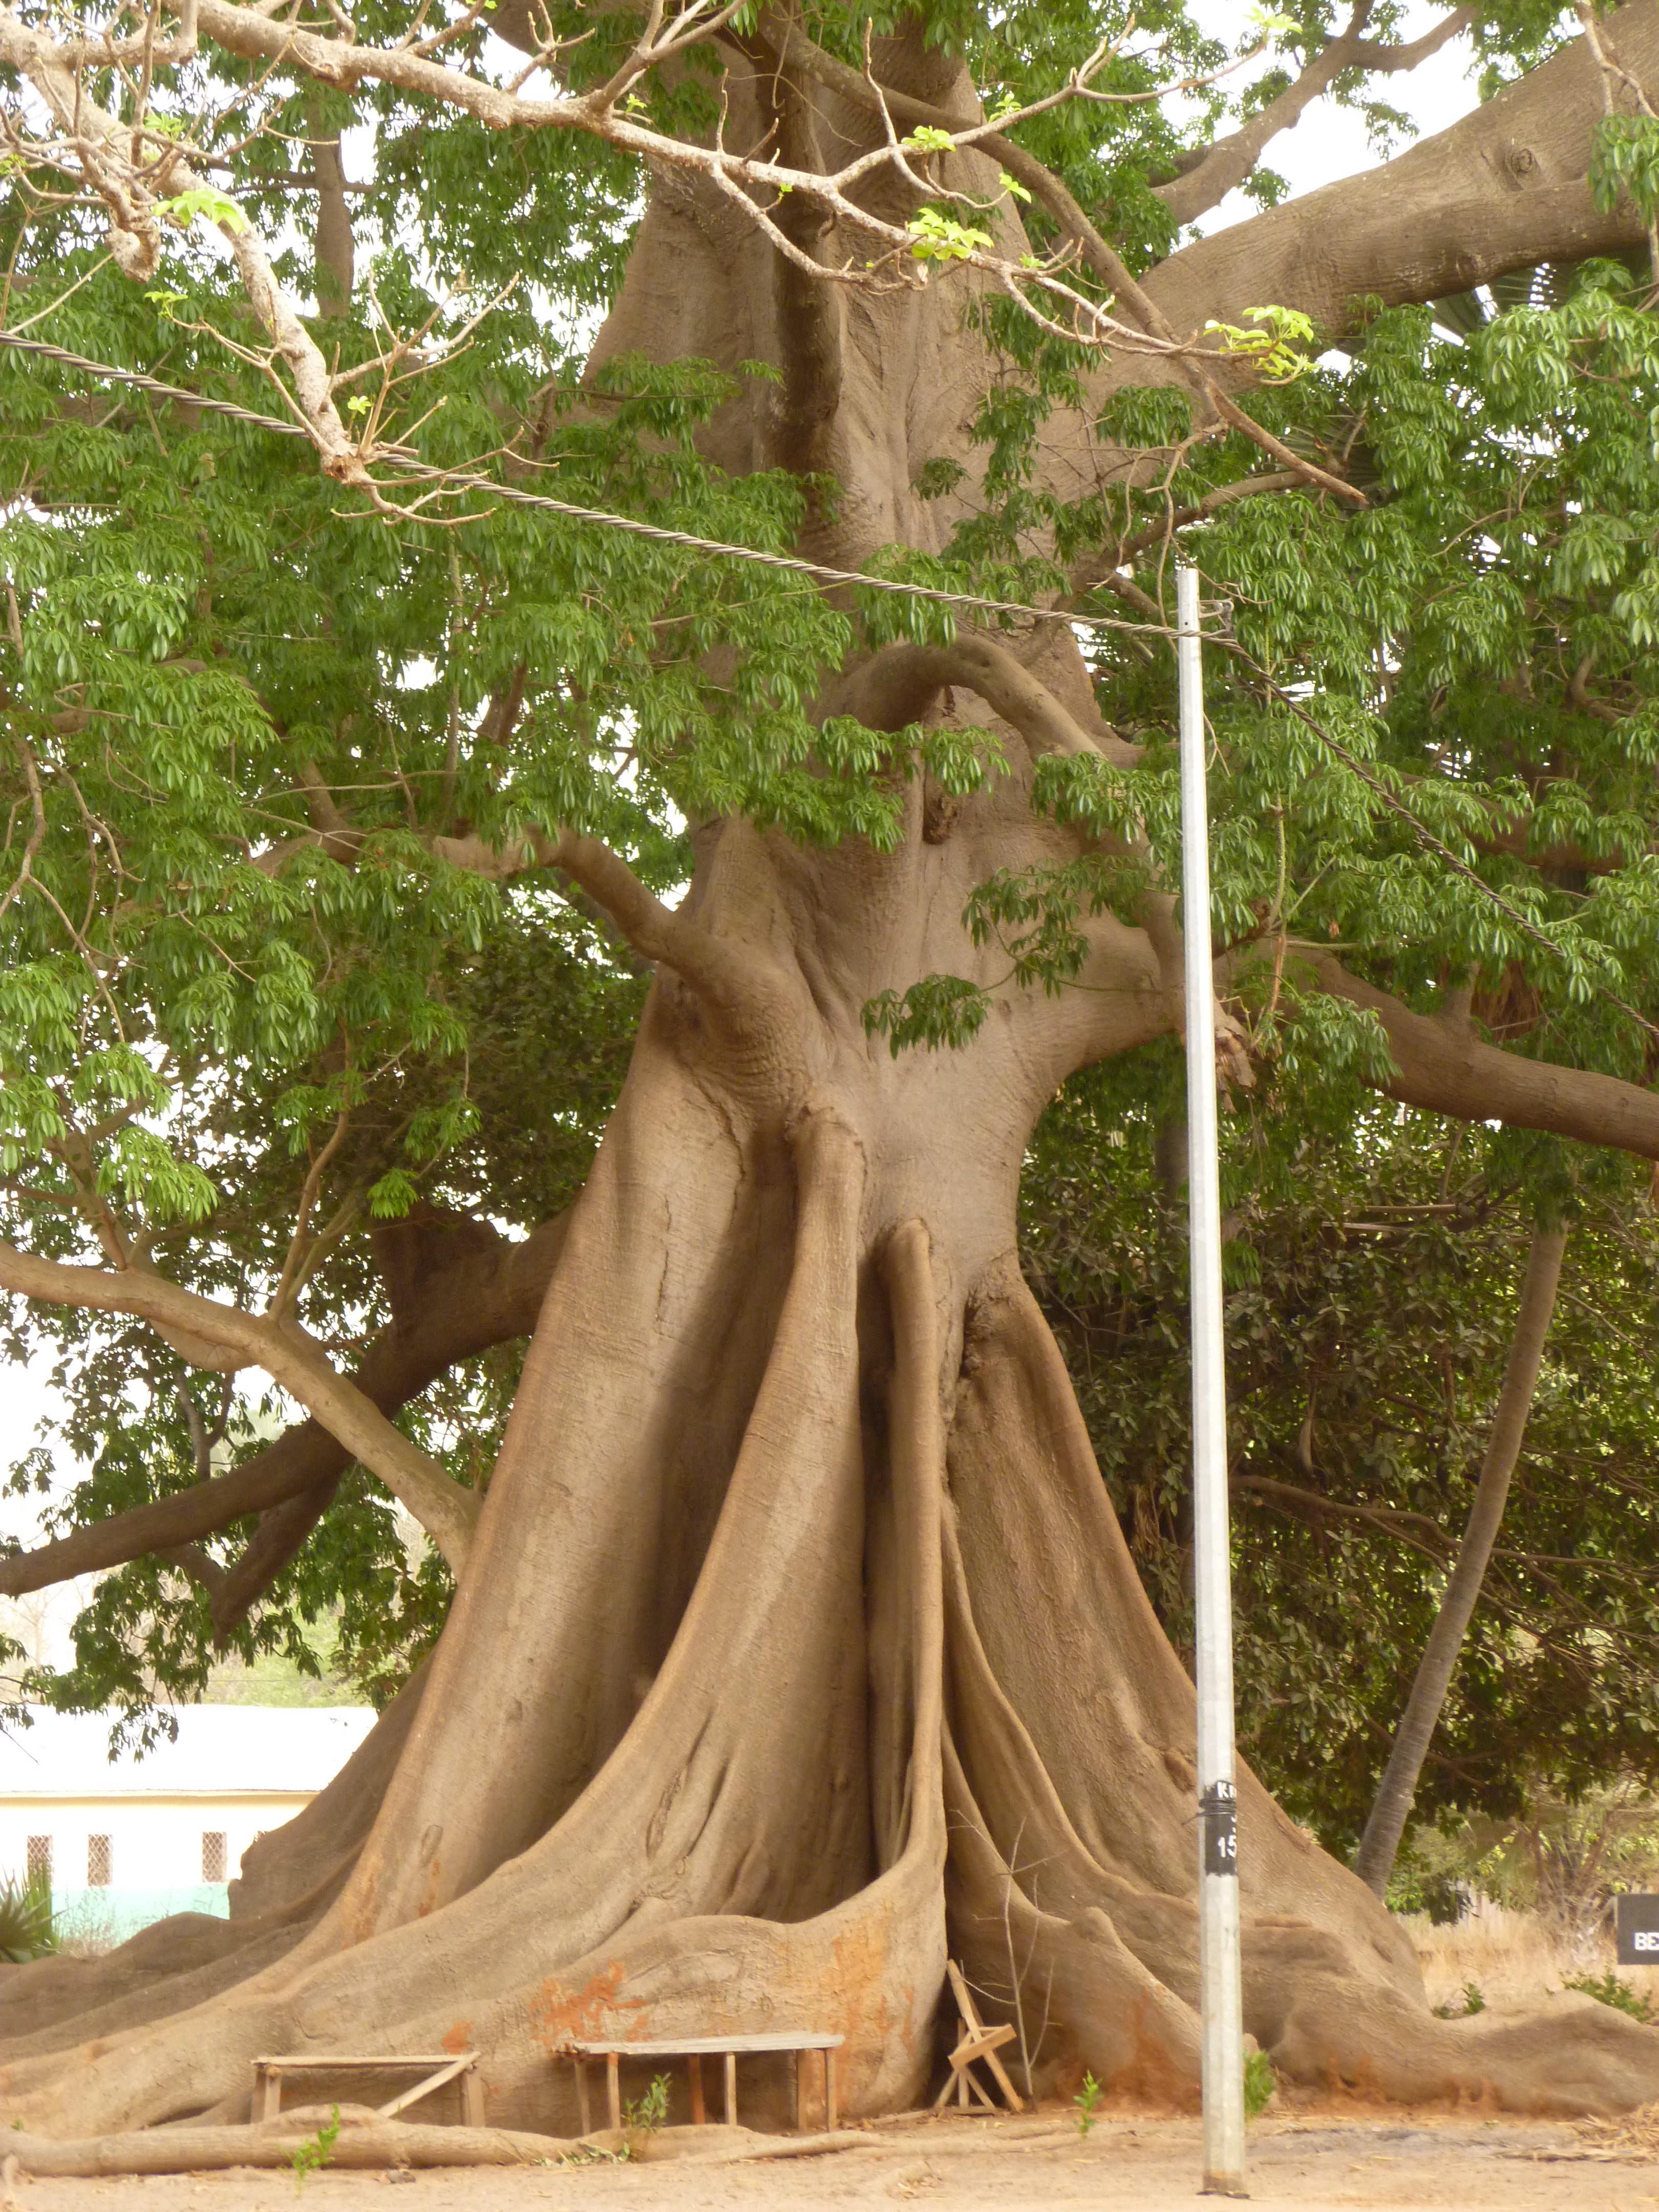 Mahagonibaum  File:Mahagoni-Baum.jpg - Wikimedia Commons